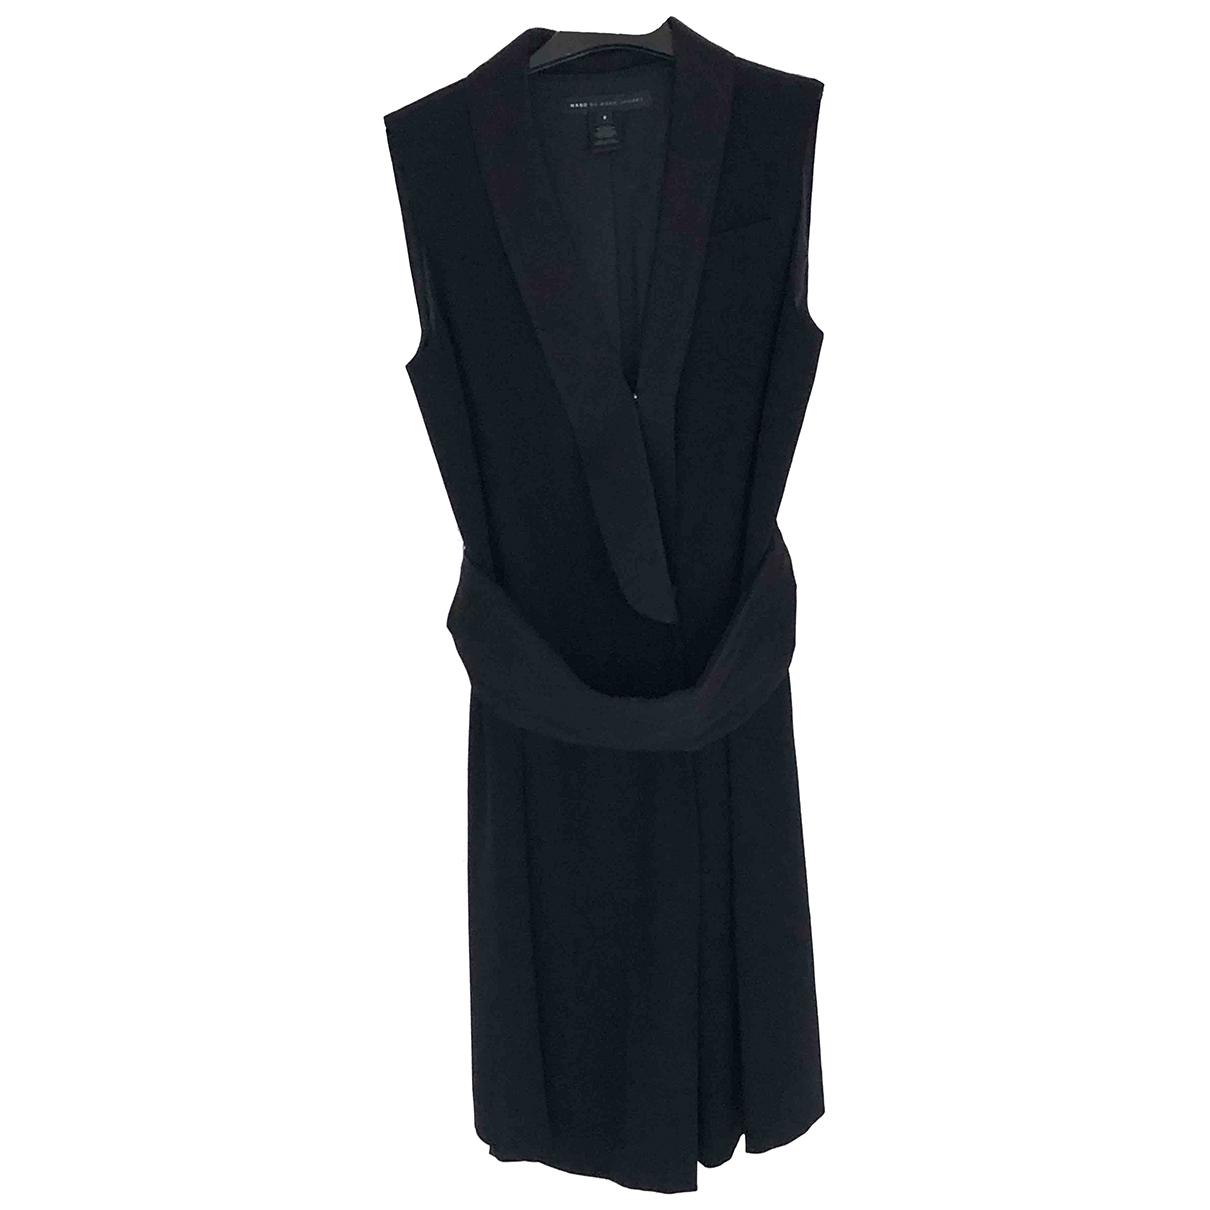 Marc By Marc Jacobs \N Kleid in  Schwarz Polyester